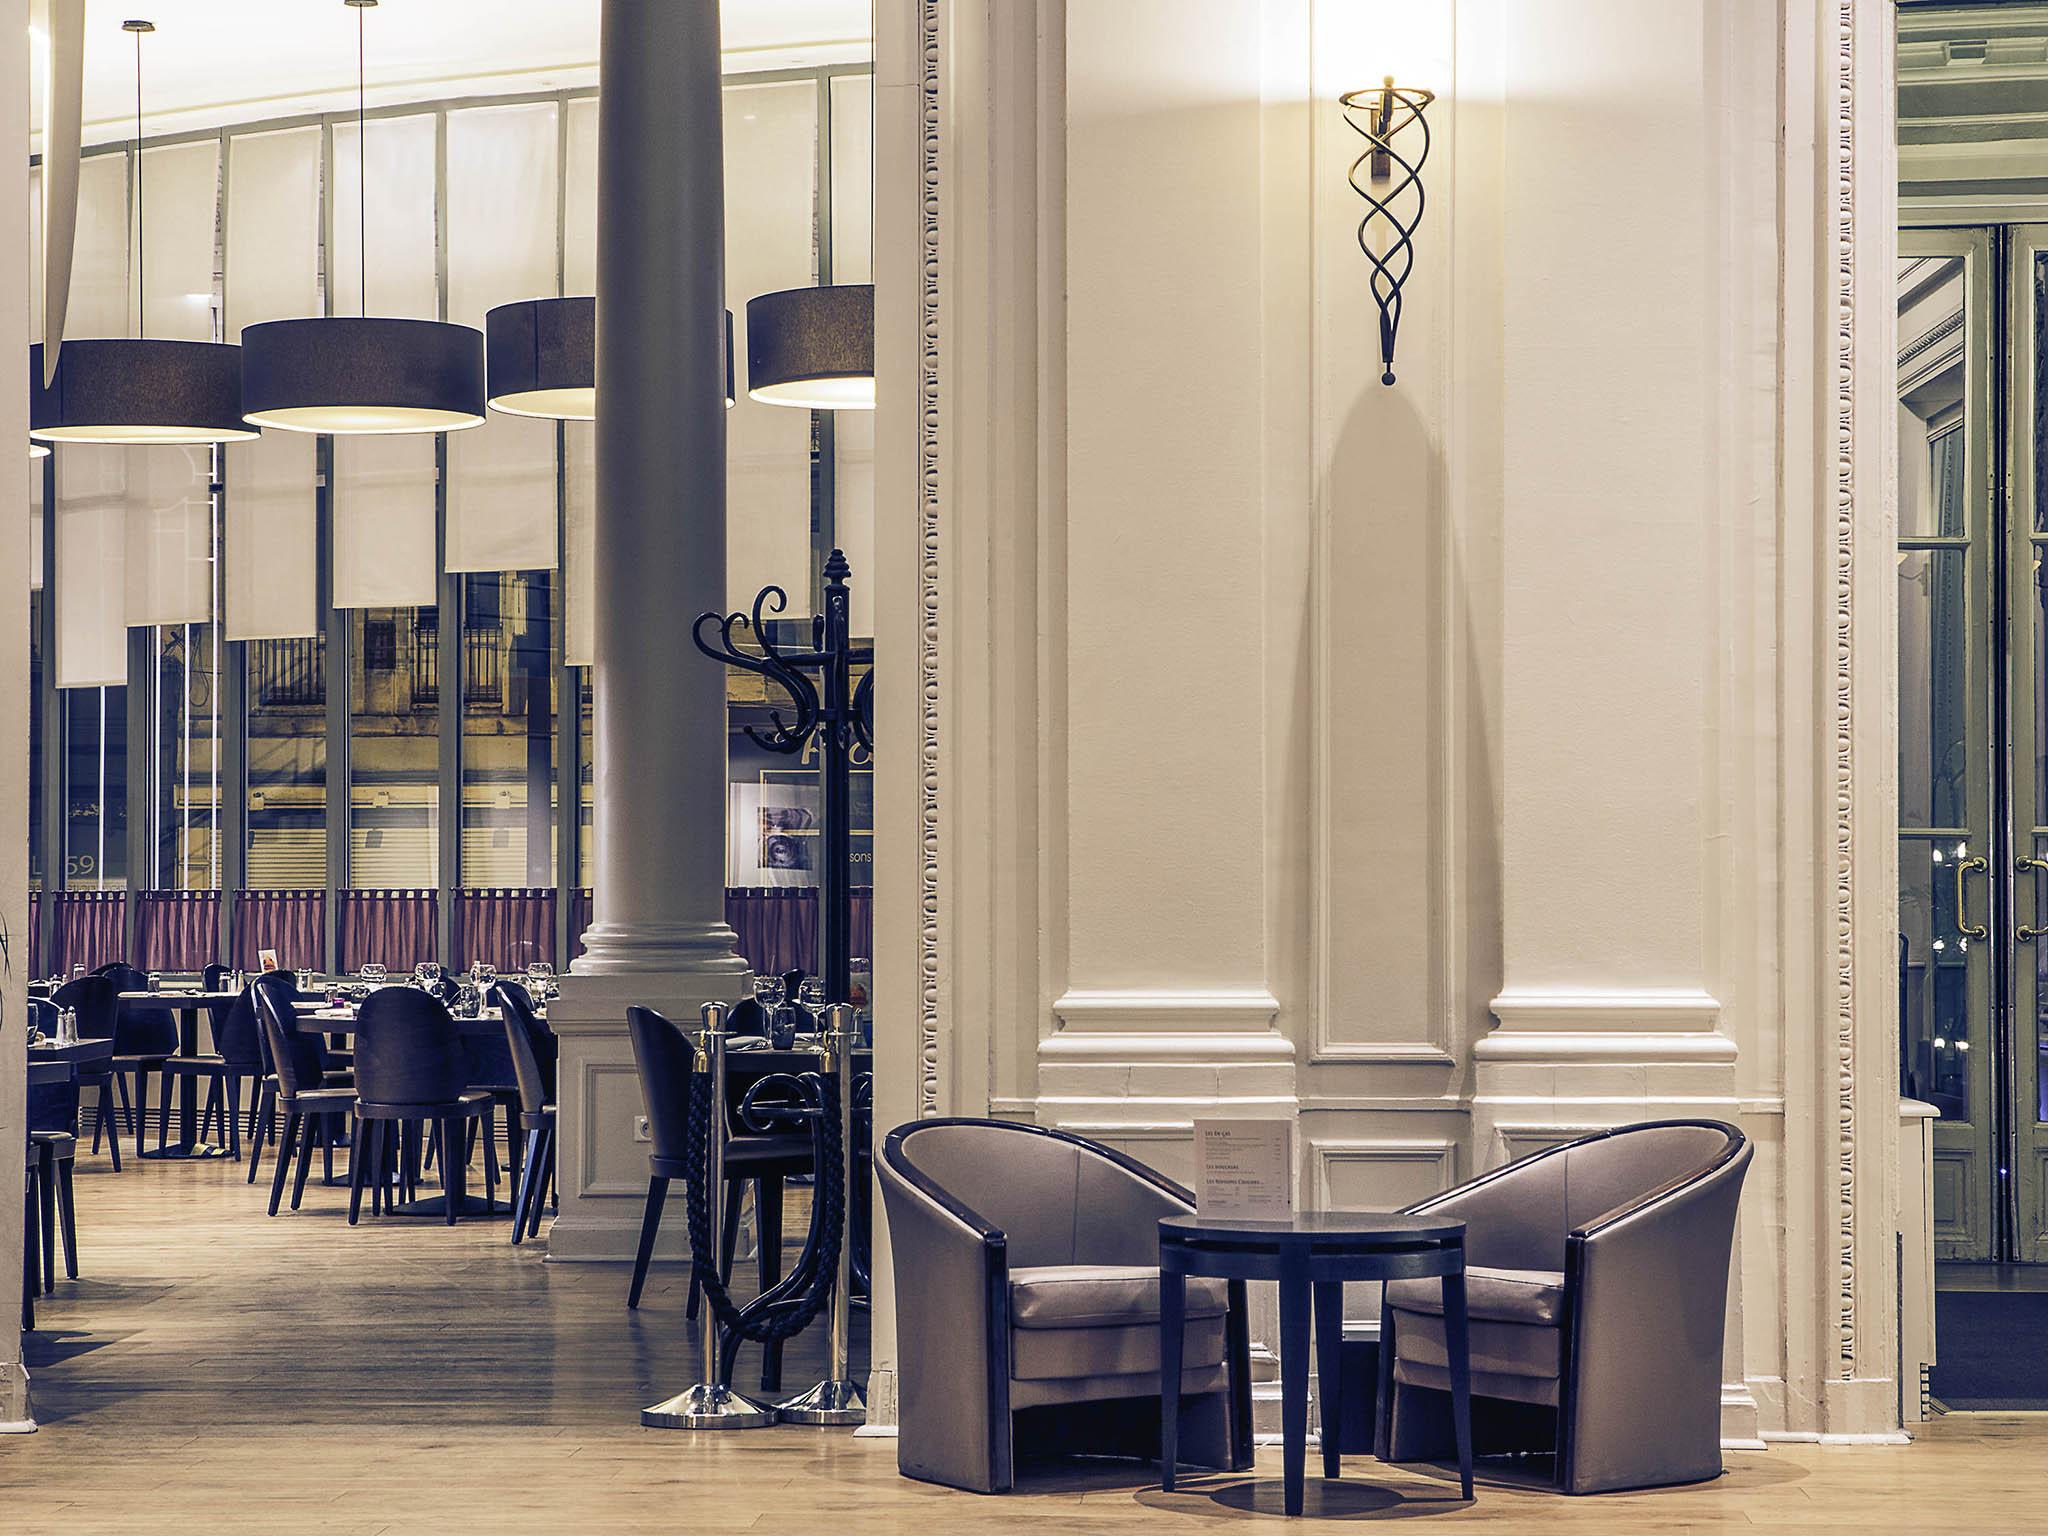 Hotel – Mercure Lille Roubaix Grand Hôtel